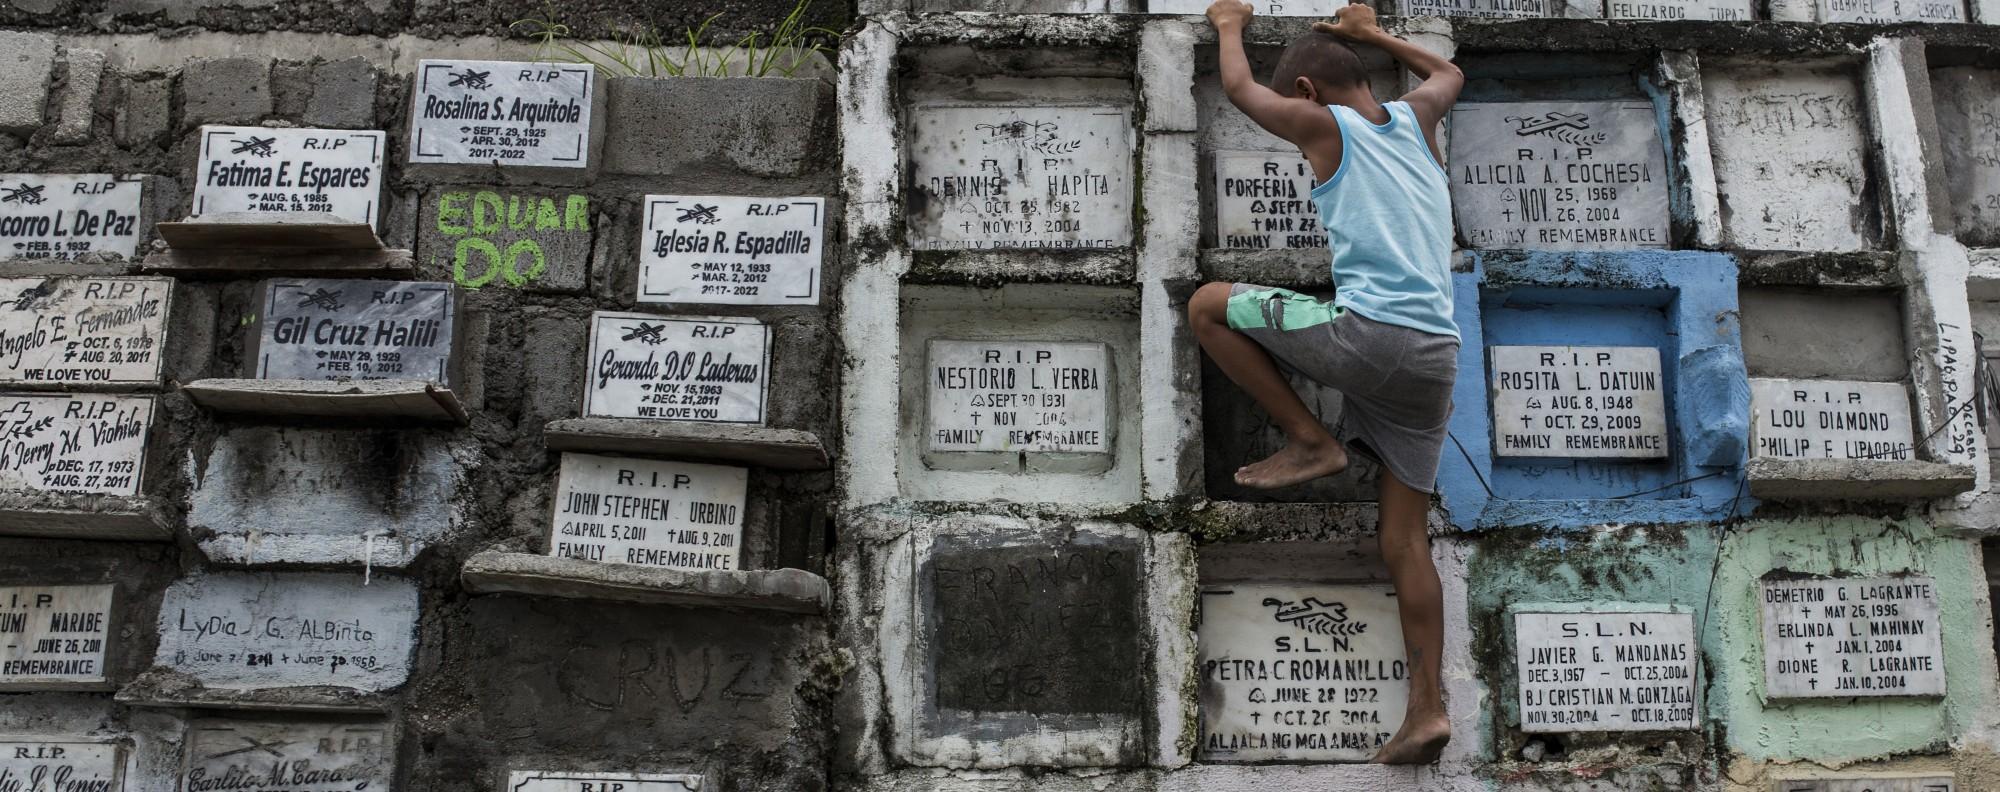 Bone boxes at Navotas City Cemetery, Manila. Picture: Paul Ratje